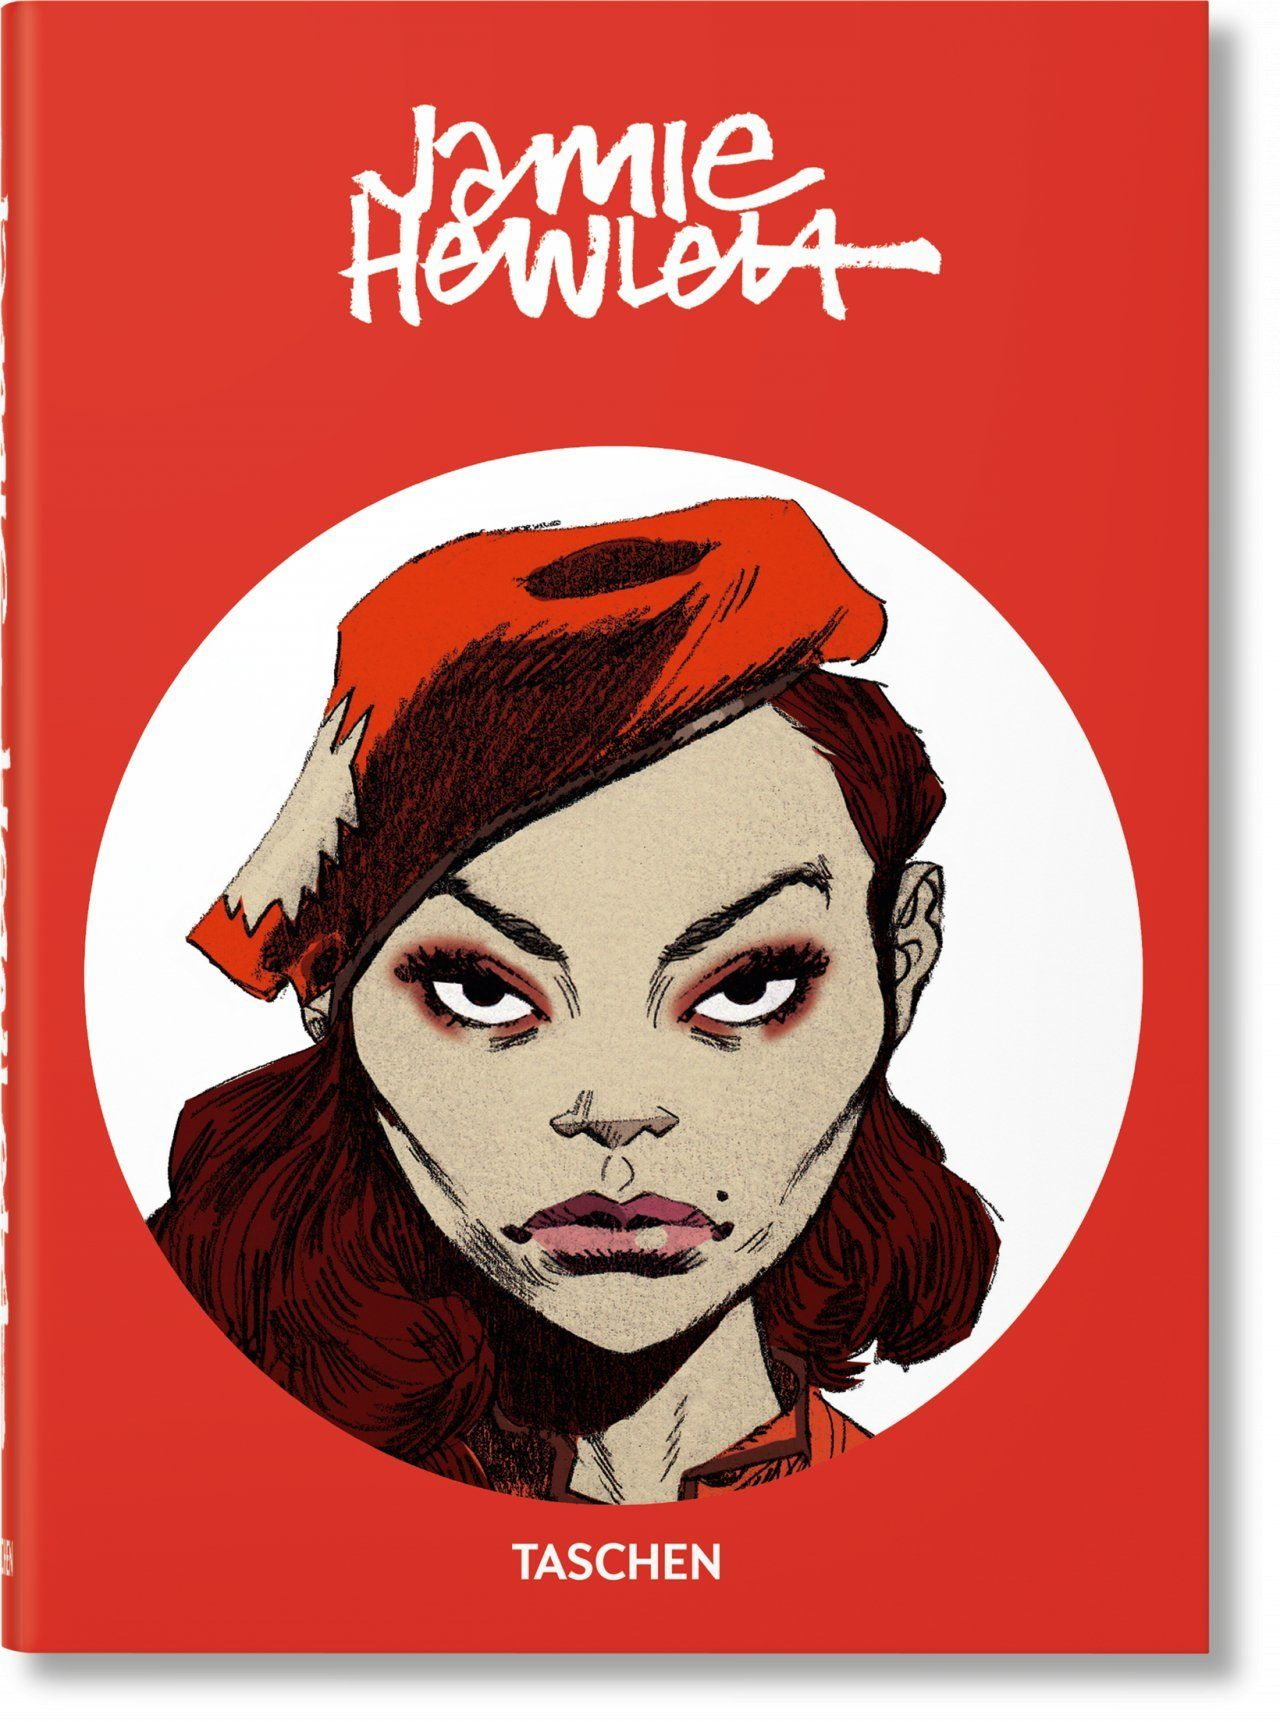 JAMIE HEWLETT – 40TH ANNIVERSARY EDITION